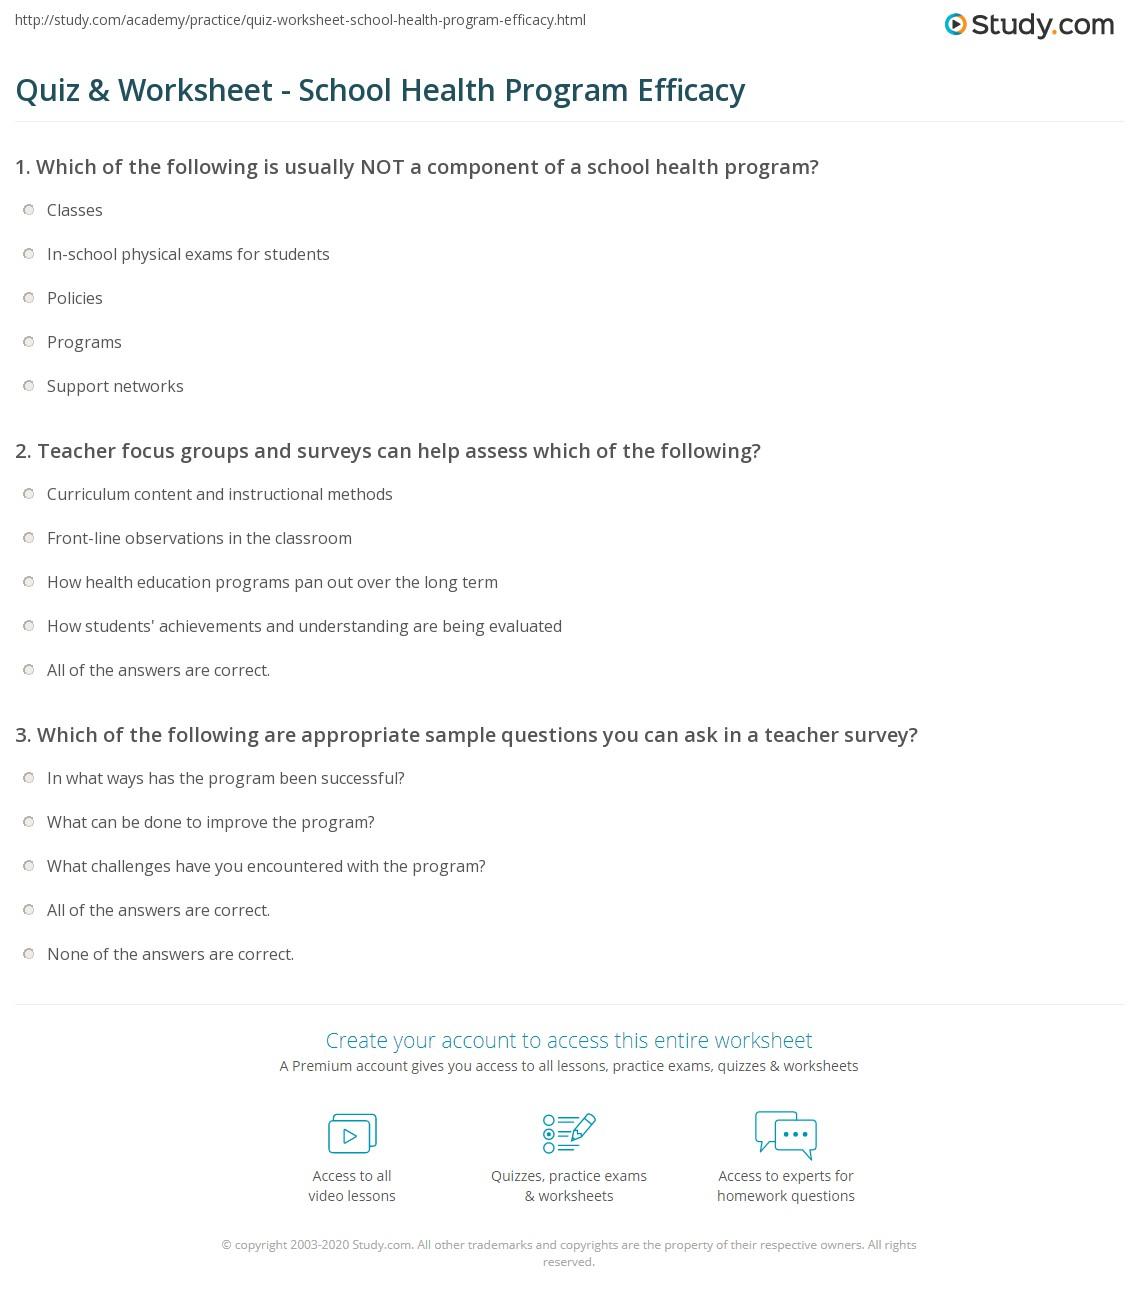 Quiz & Worksheet - School Health Program Efficacy | Study com